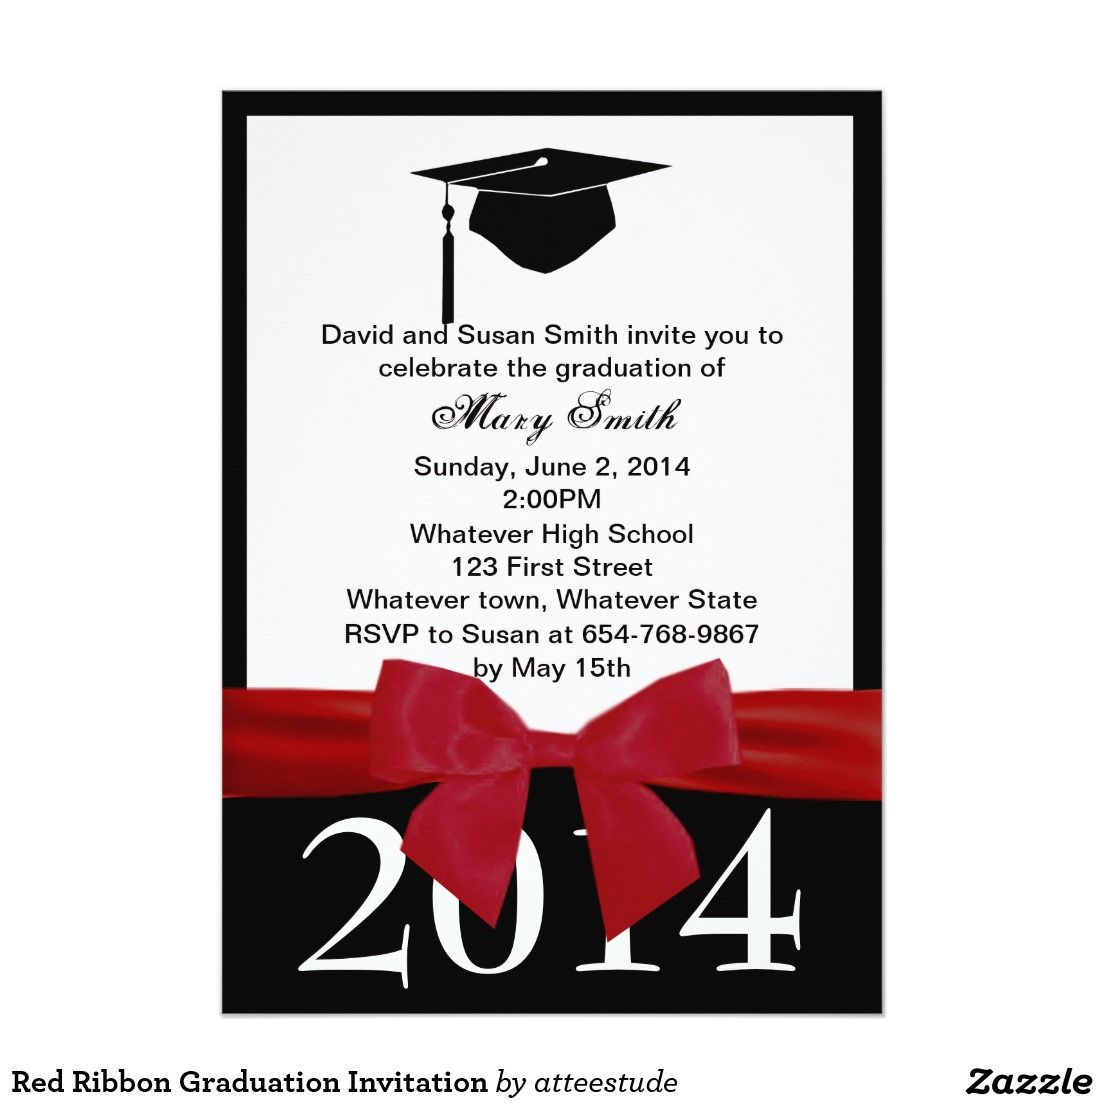 Red Ribbon Graduation Invitation | Craft